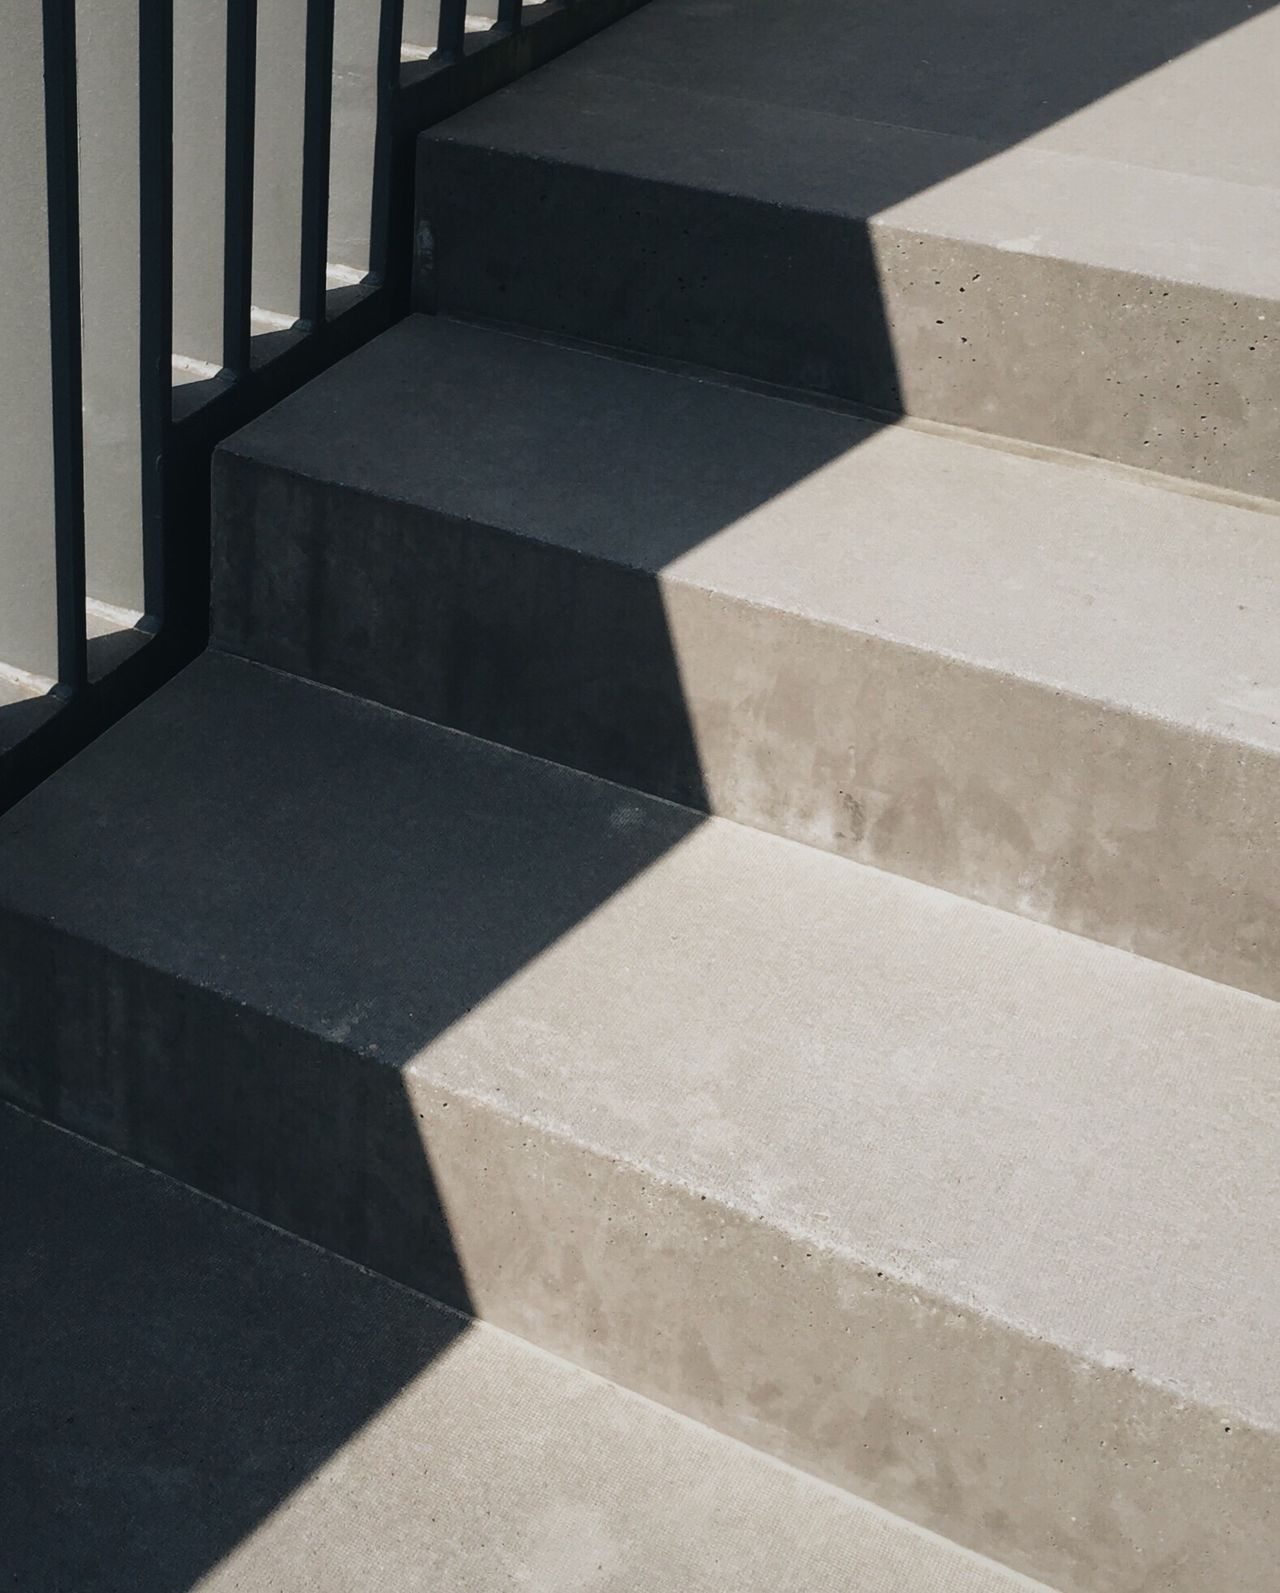 Detail shot of stairs